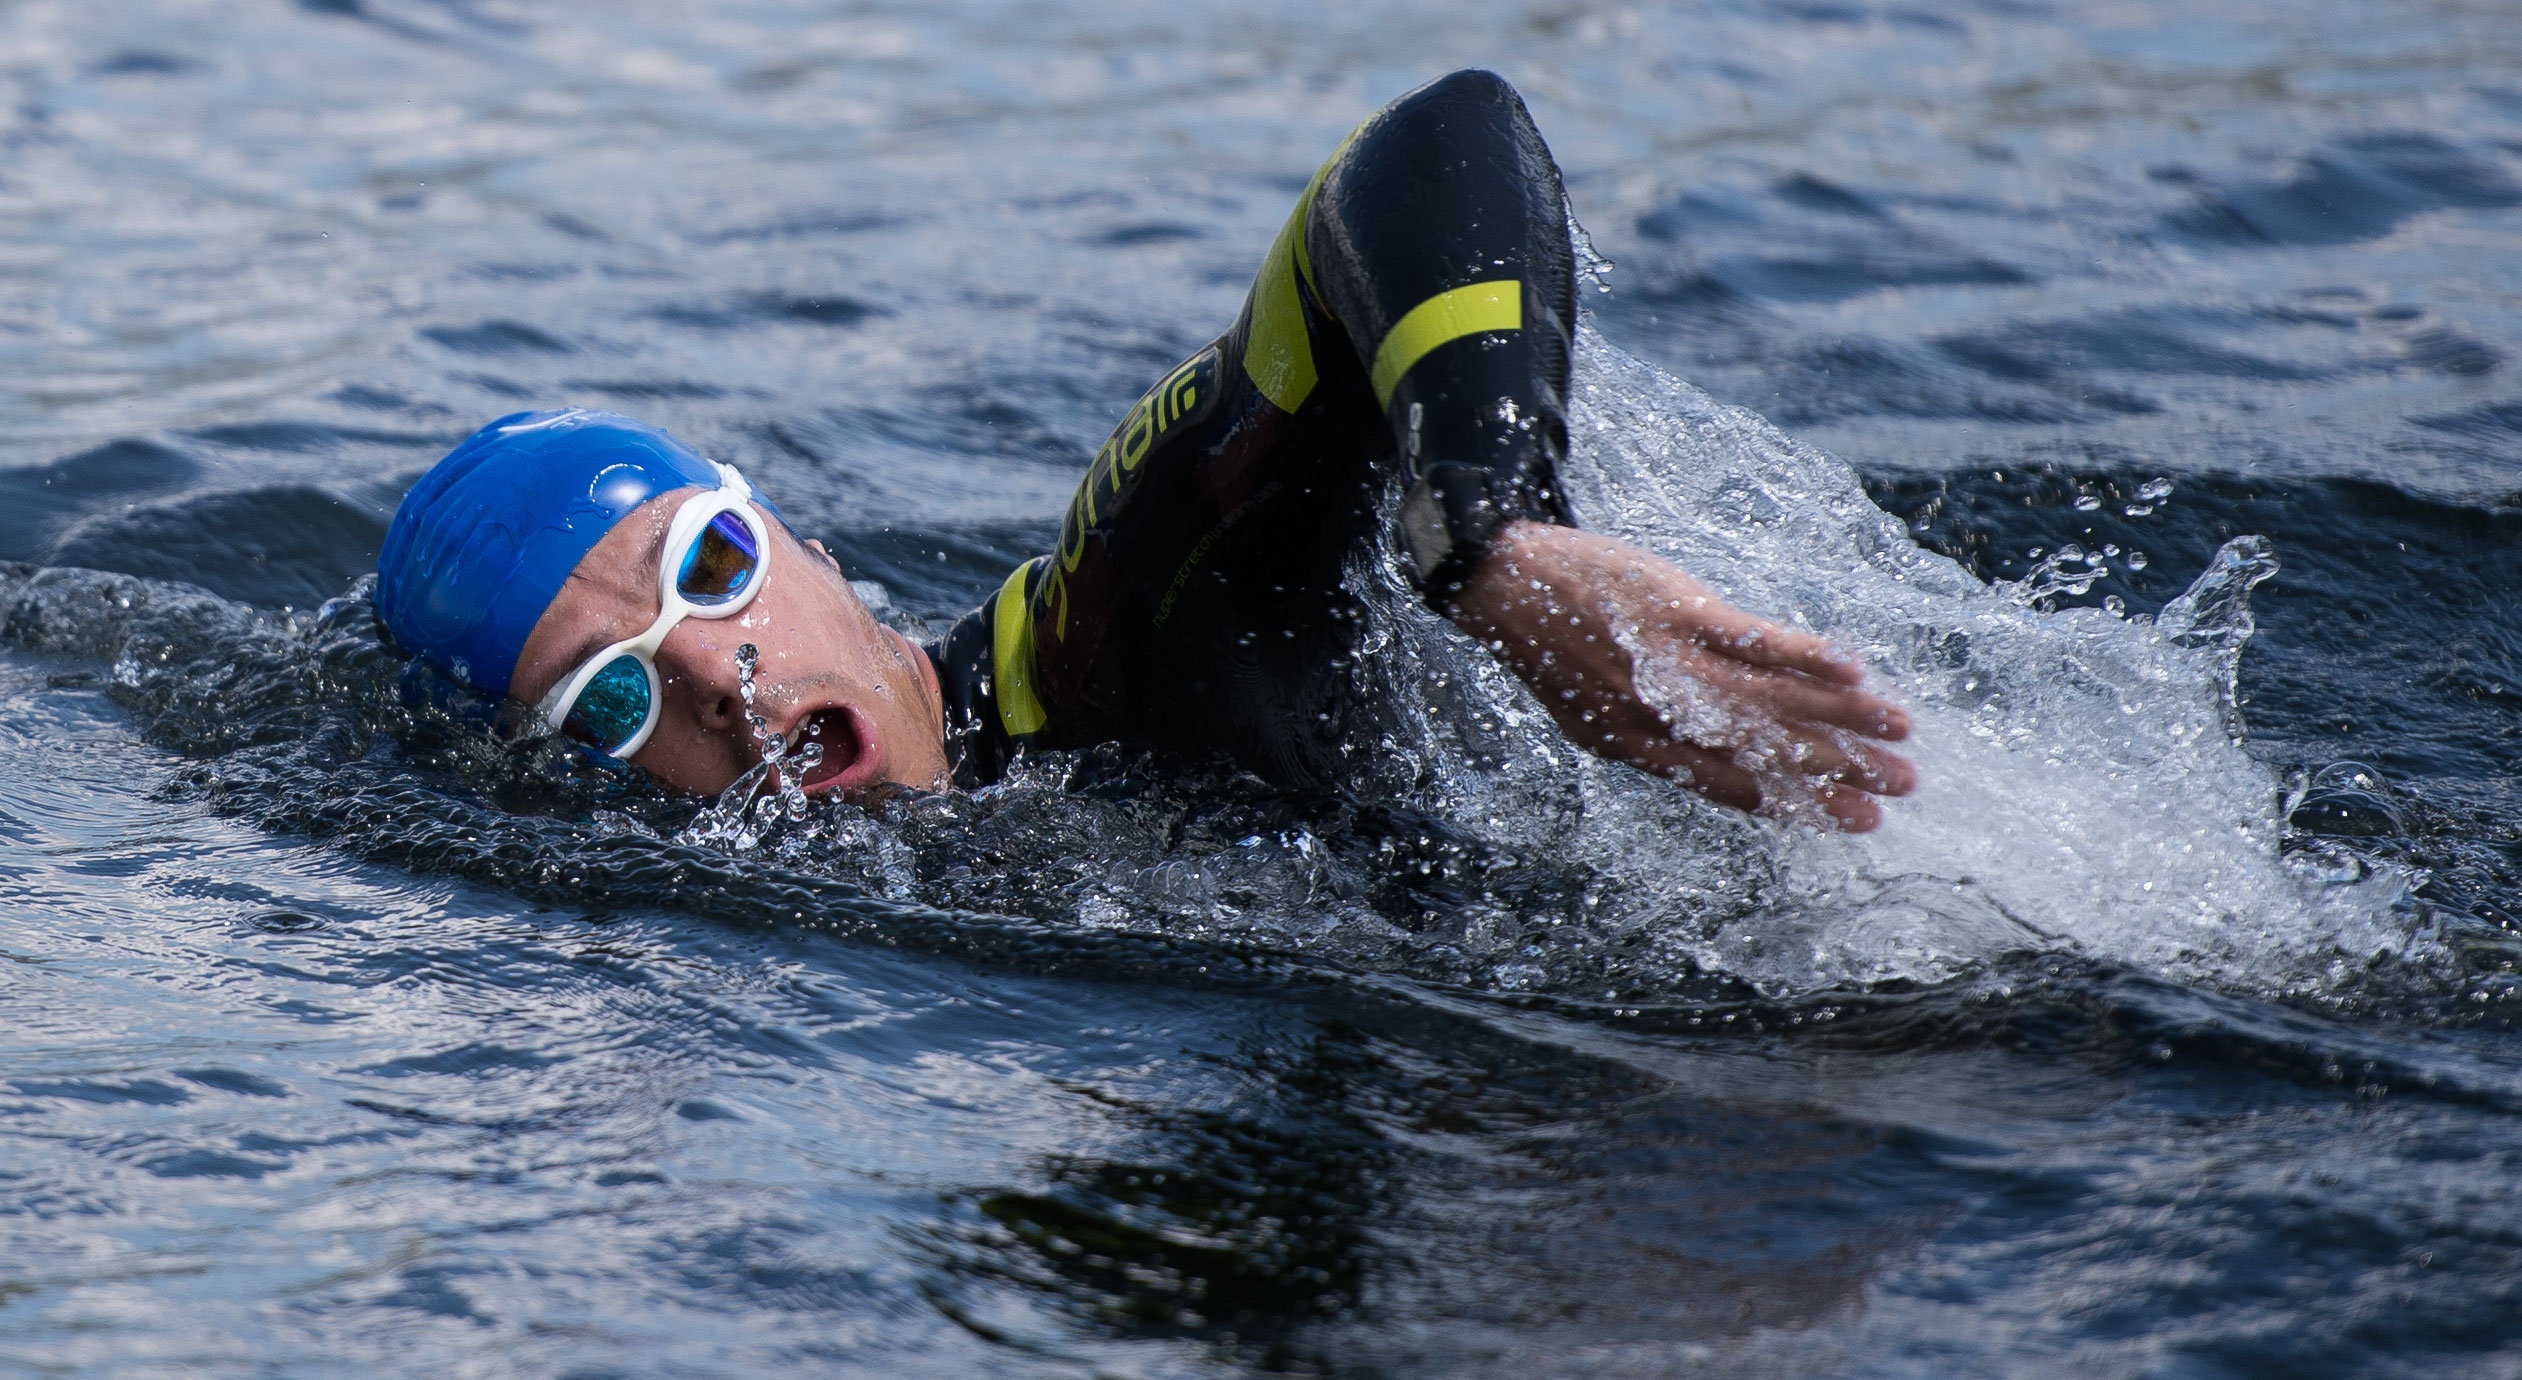 us3-triathlon-team-burguillo-jorge-jardi